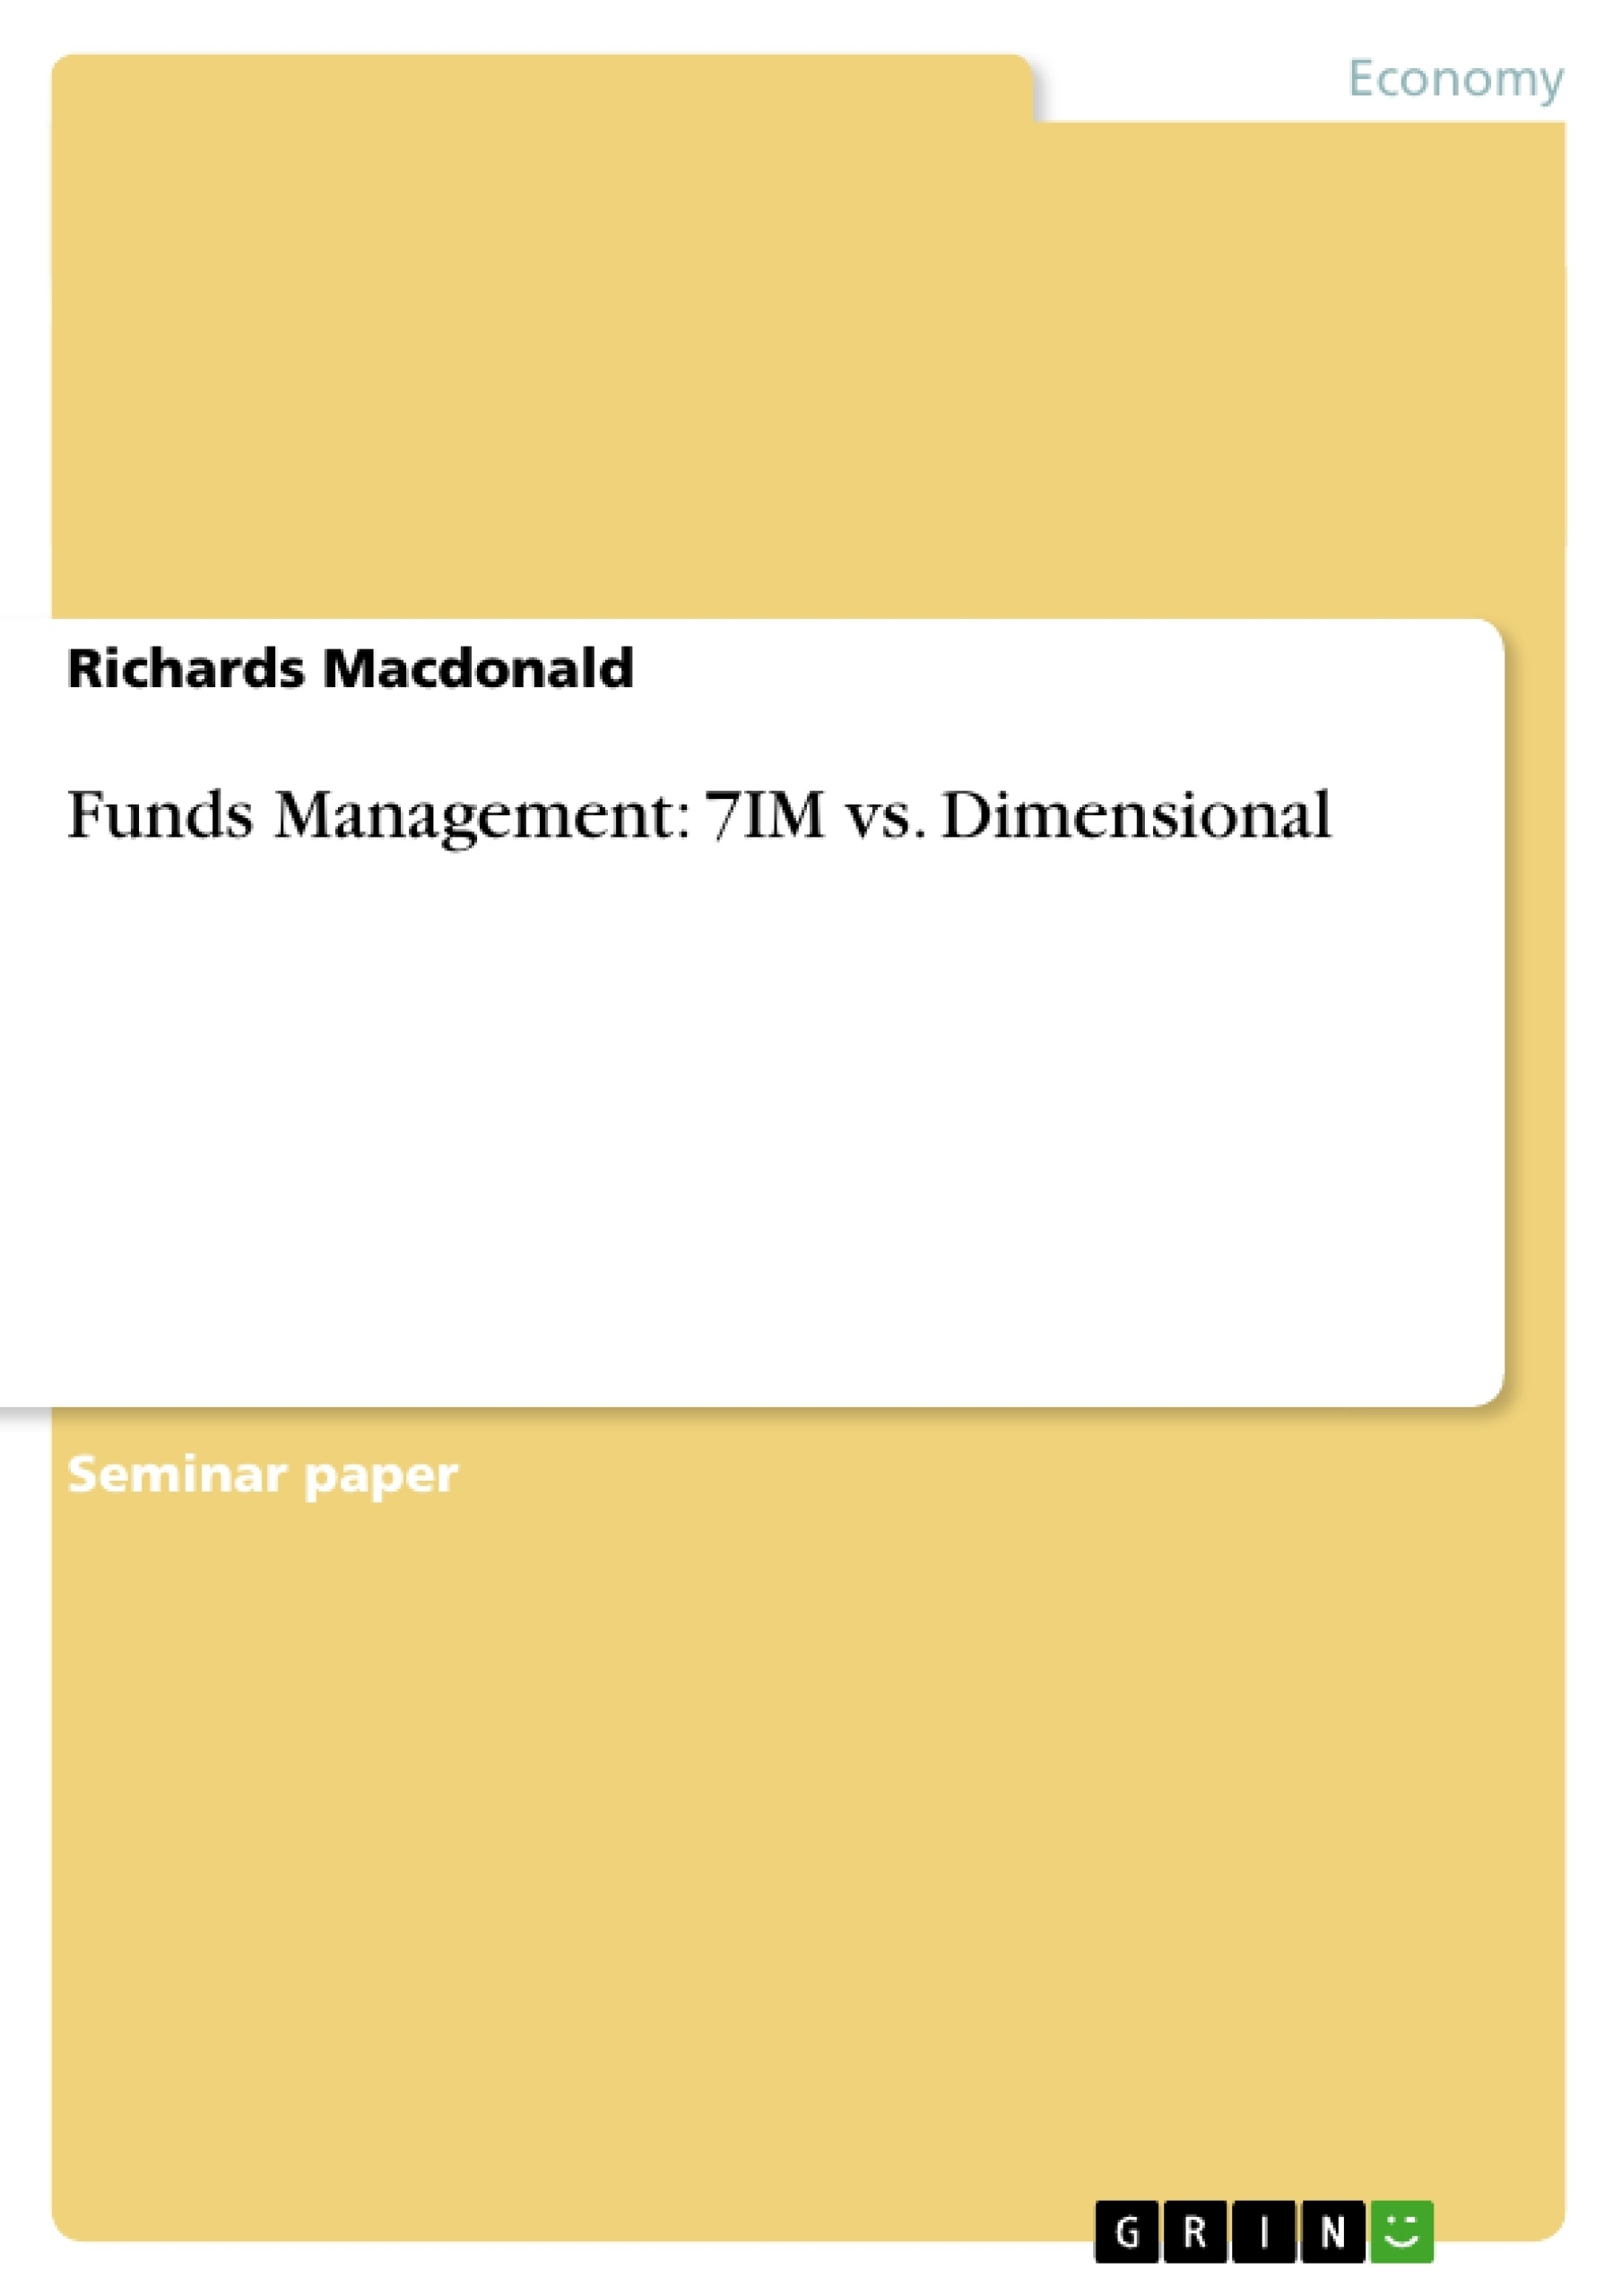 Title: Funds Management: 7IM vs. Dimensional